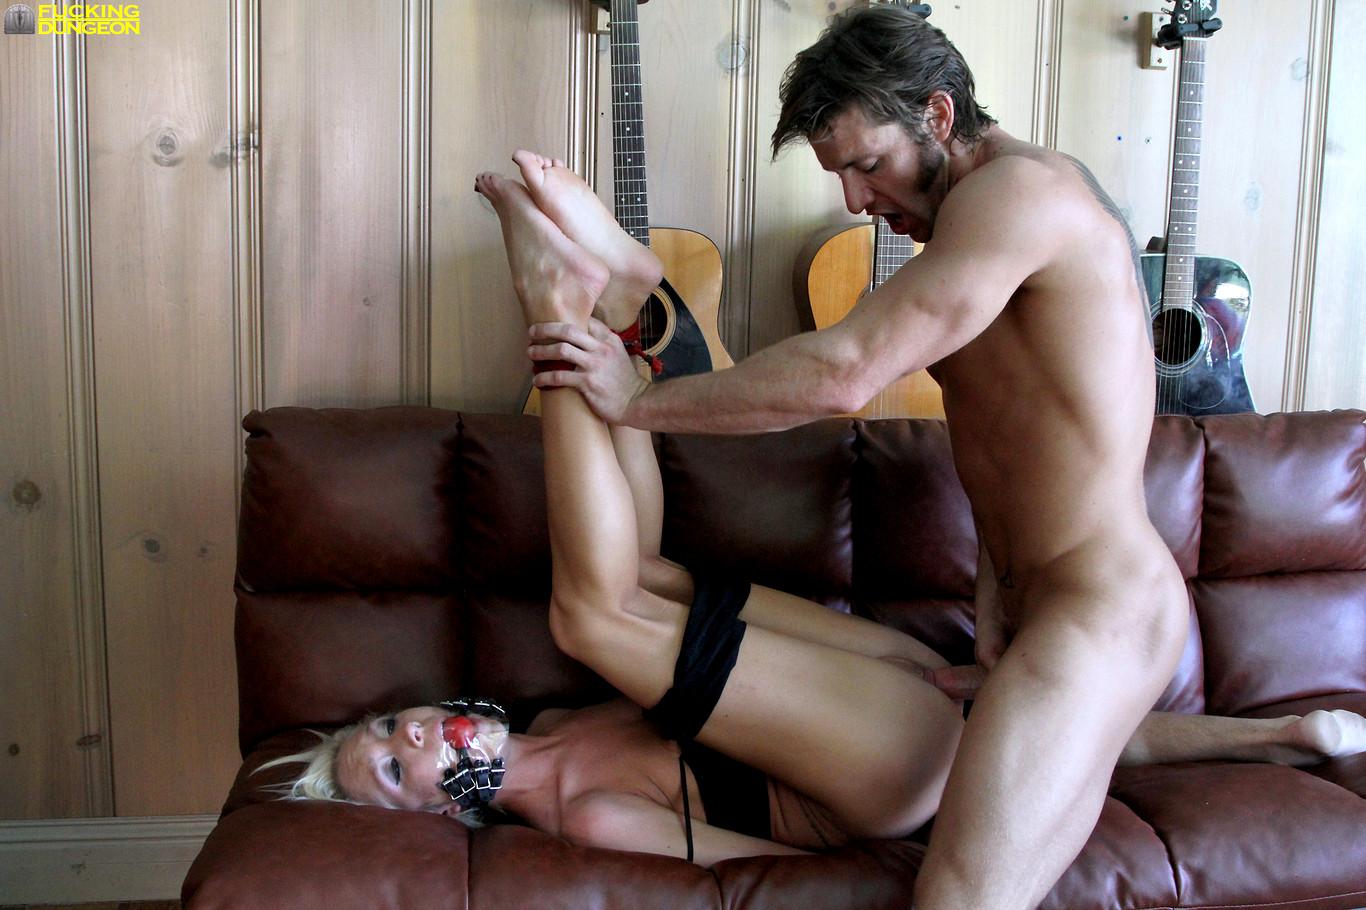 Divas sucking do men like rough sex from